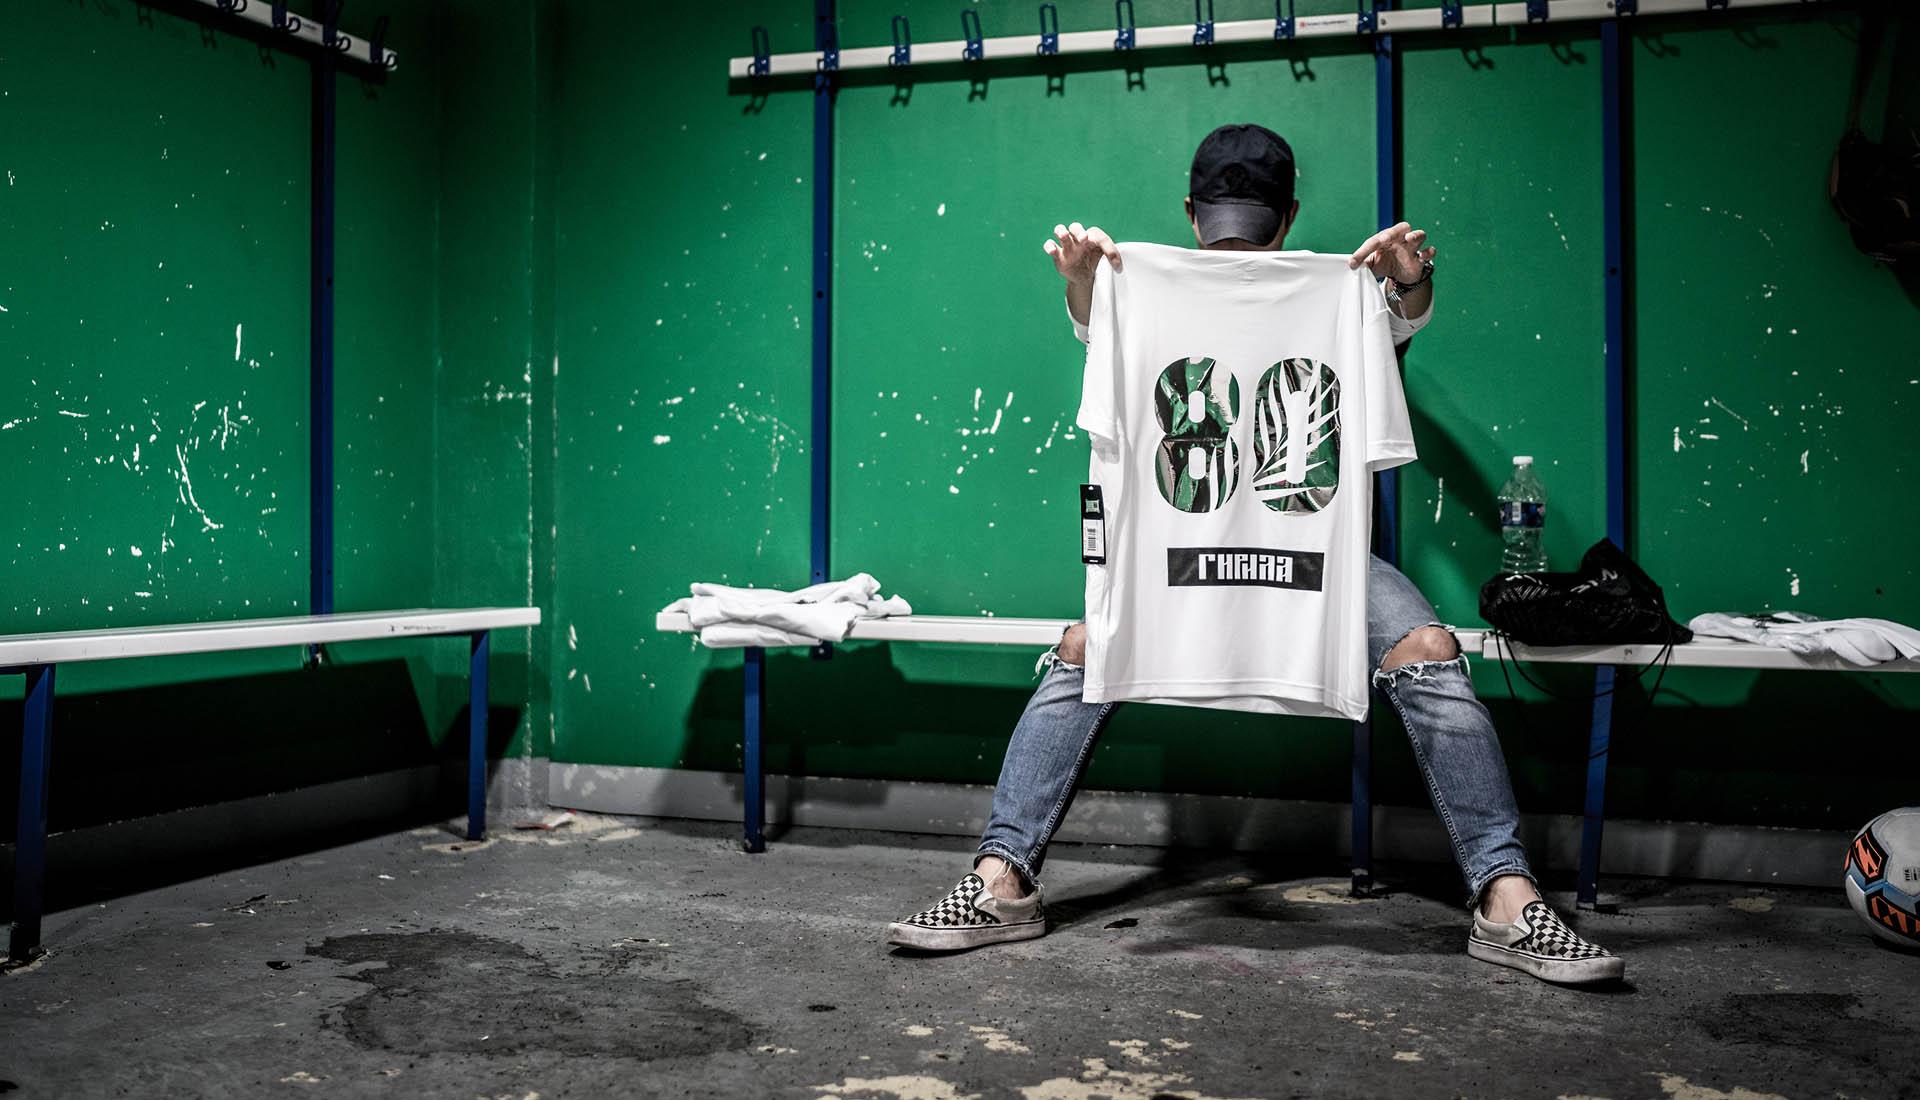 guerrilla-fc-2018-home-kit-by-umbro-usa_0001_9.jpg